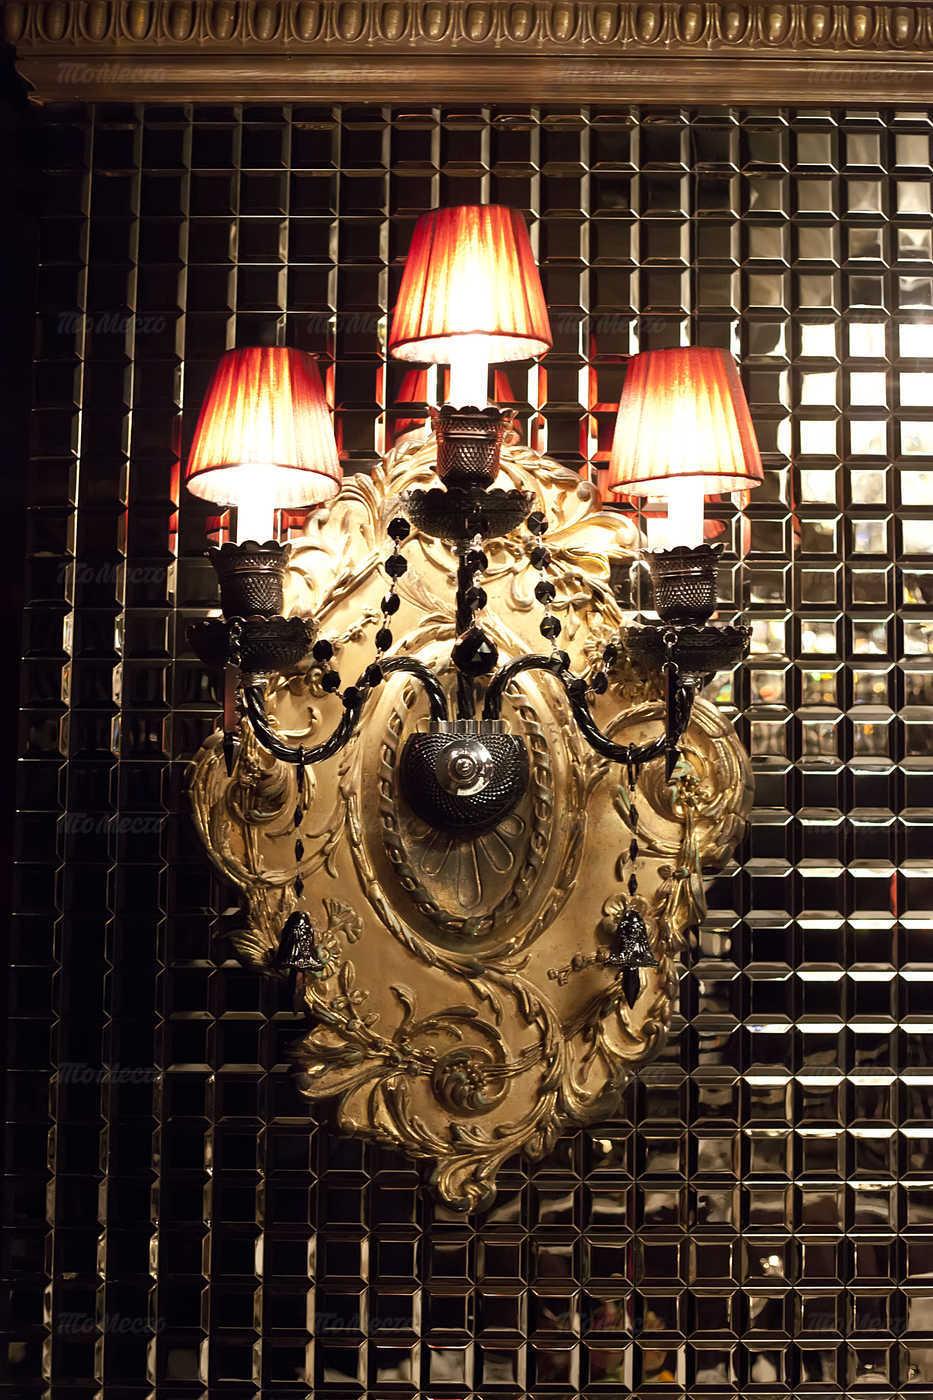 Меню караоке клуба, ресторана Лучано (Lucianno) на Невском проспекте